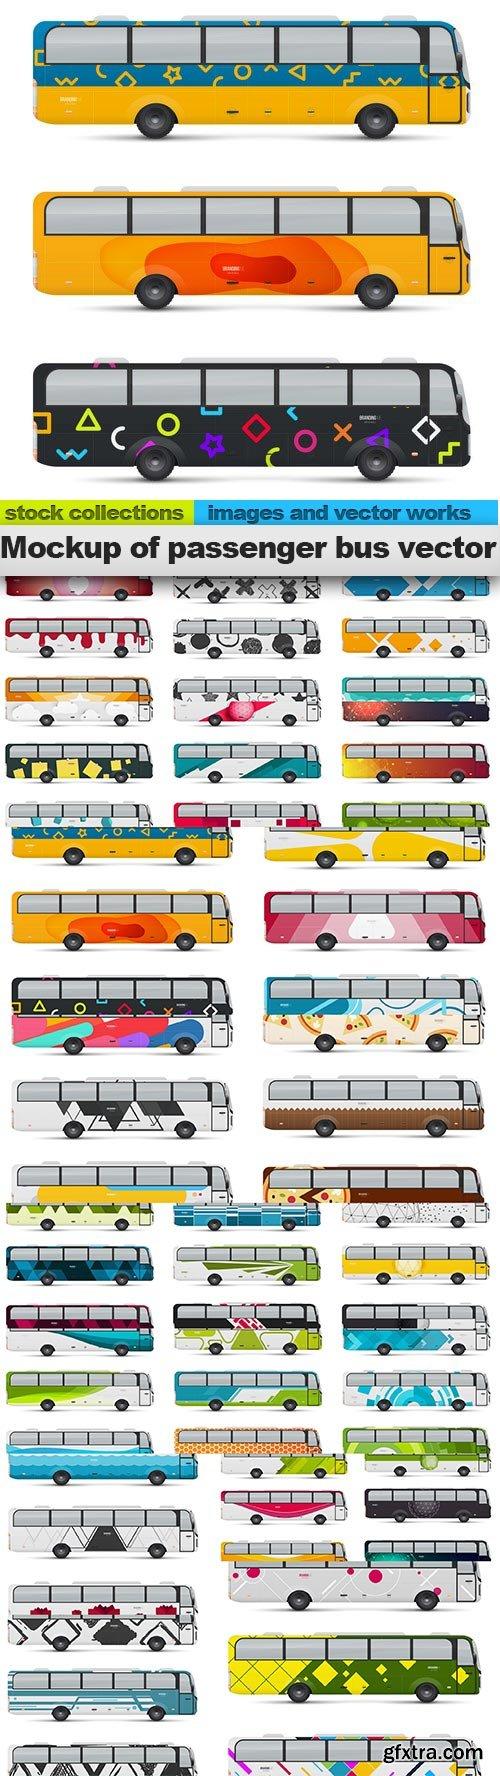 Mockup of passenger bus vector, 21 x EPS